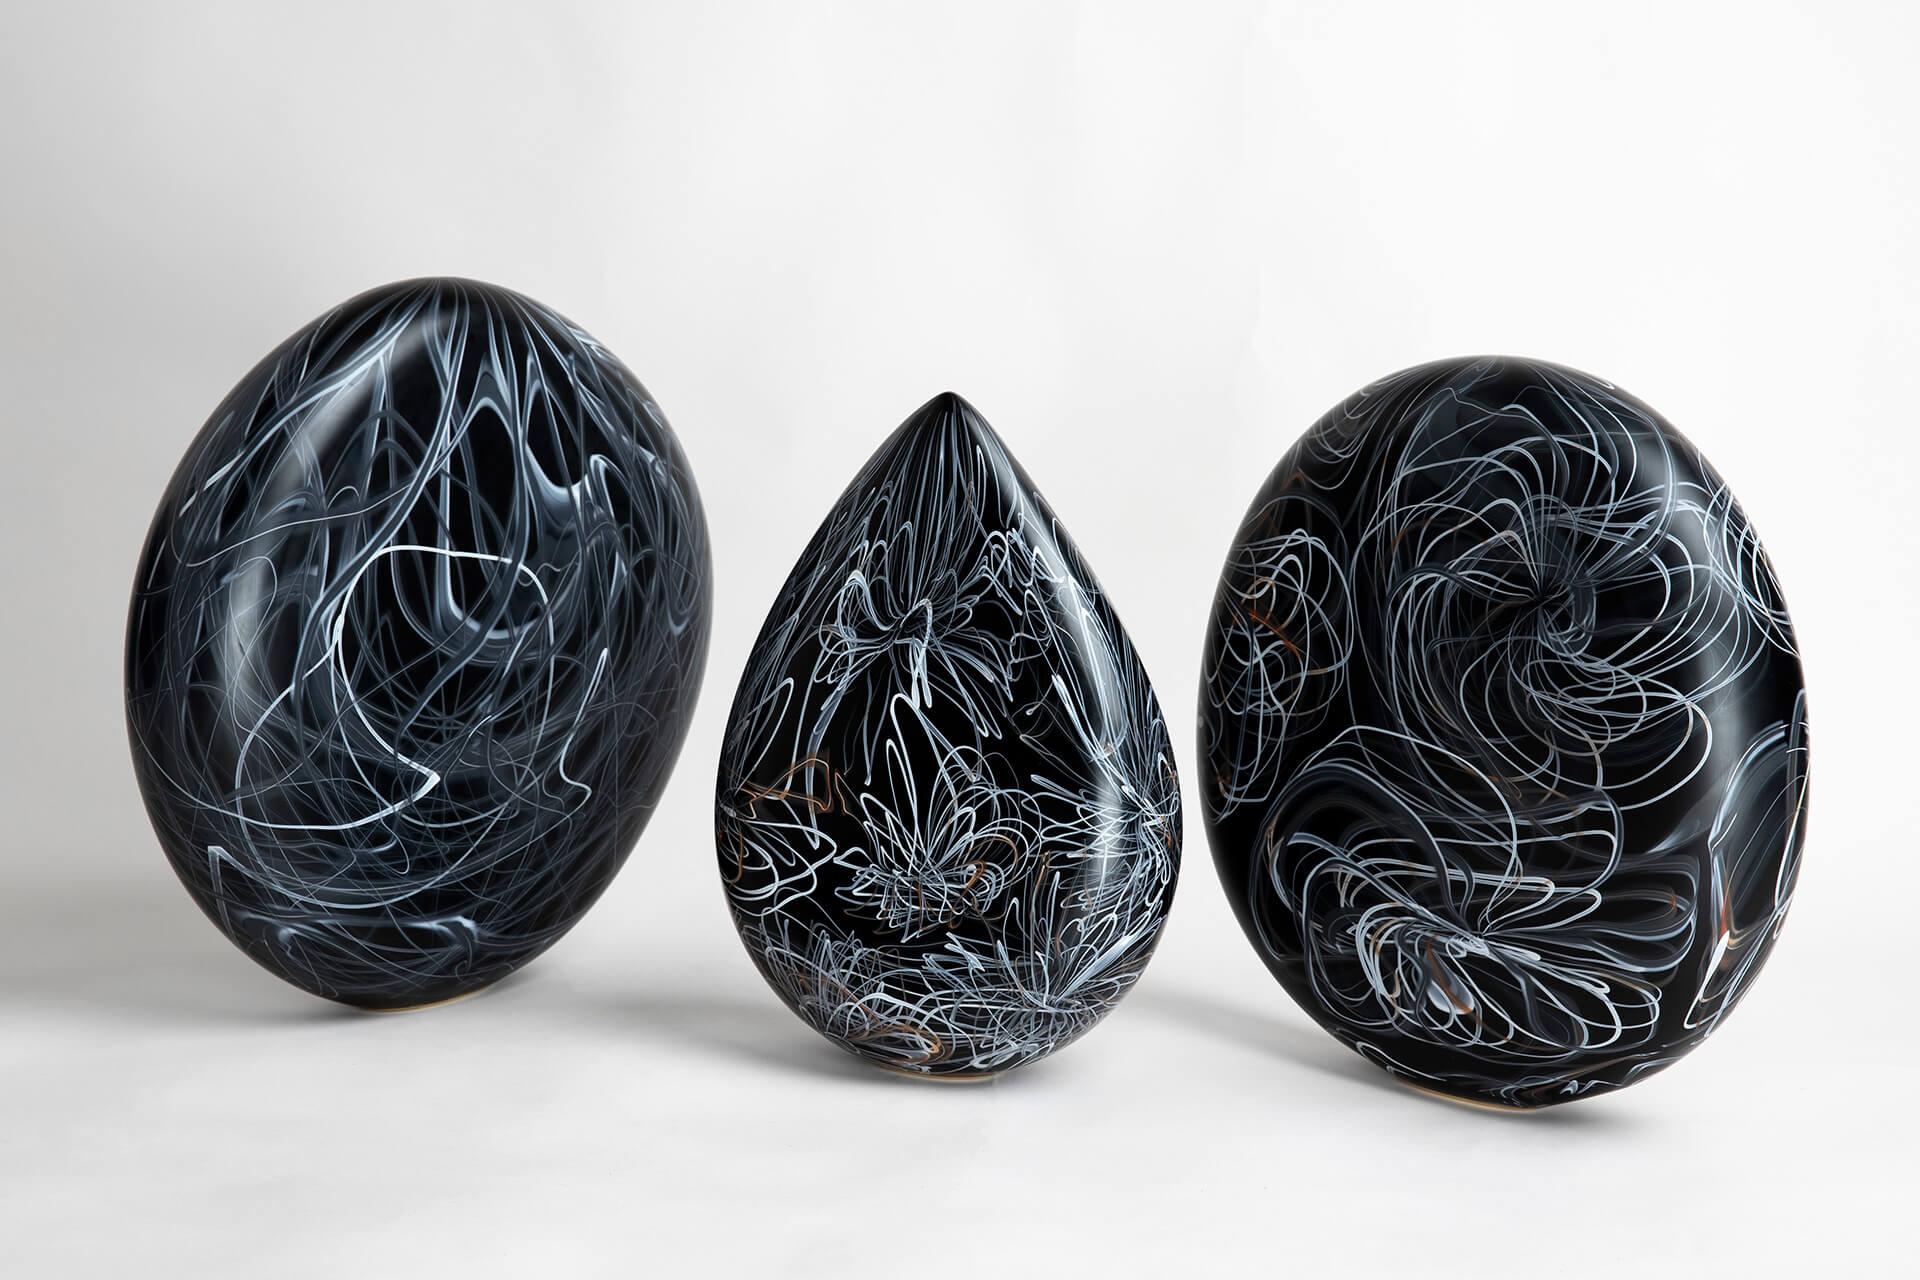 Floating Lines, Jonas Noël Niedermann, Michelangelo Foundation, Artisan, Glass craft,  Cæciliie Philipa Vibe Pedersen